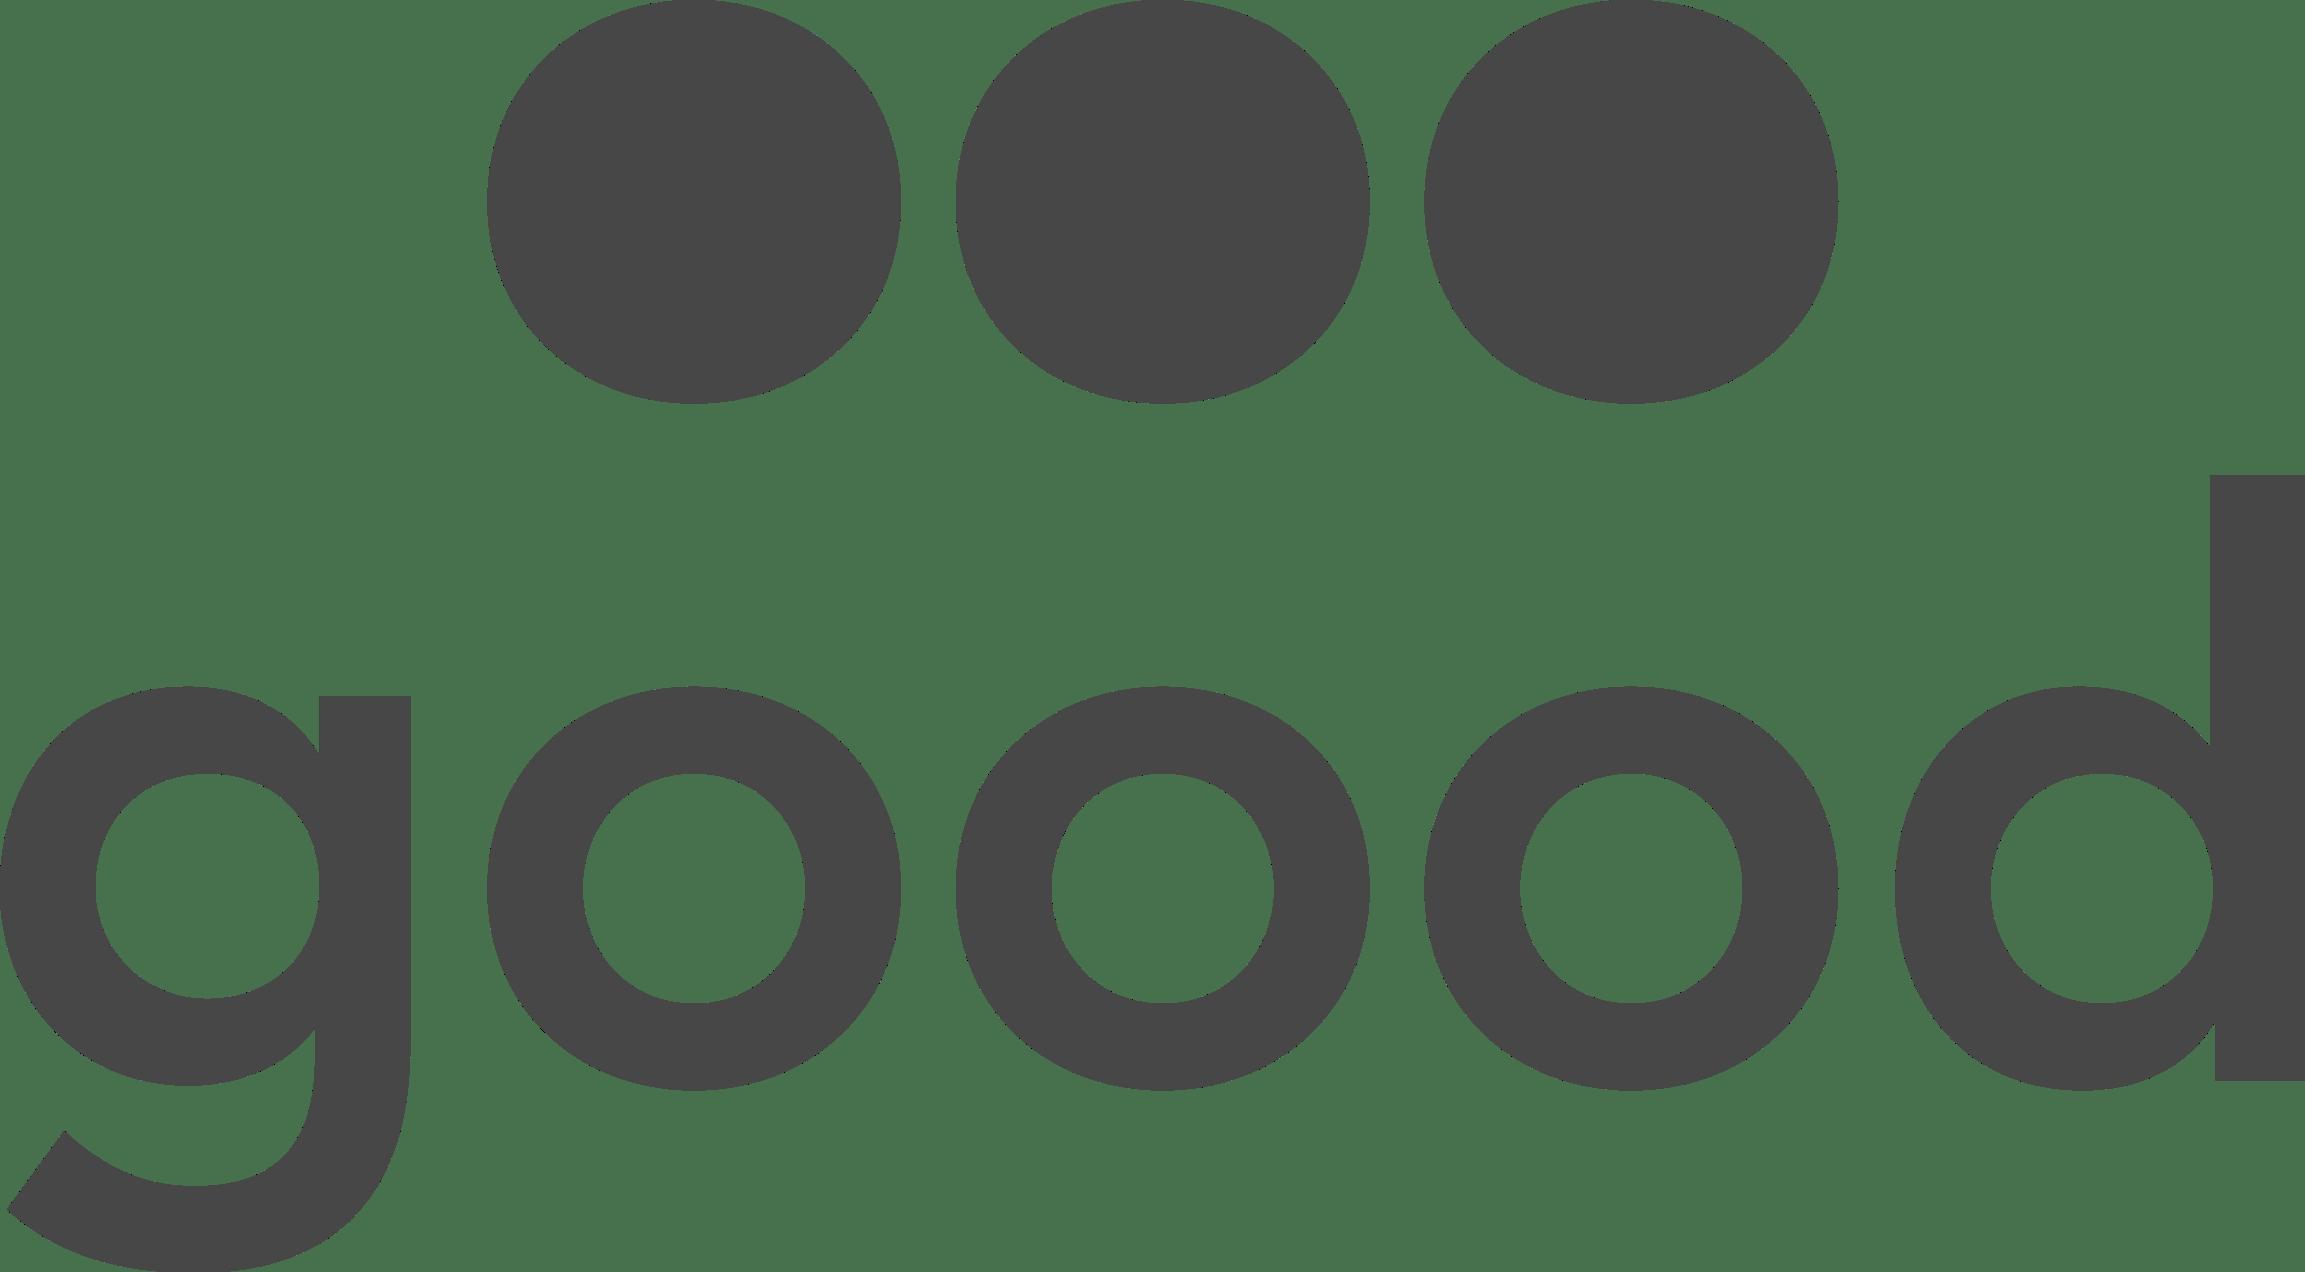 Goood Mobile company logo